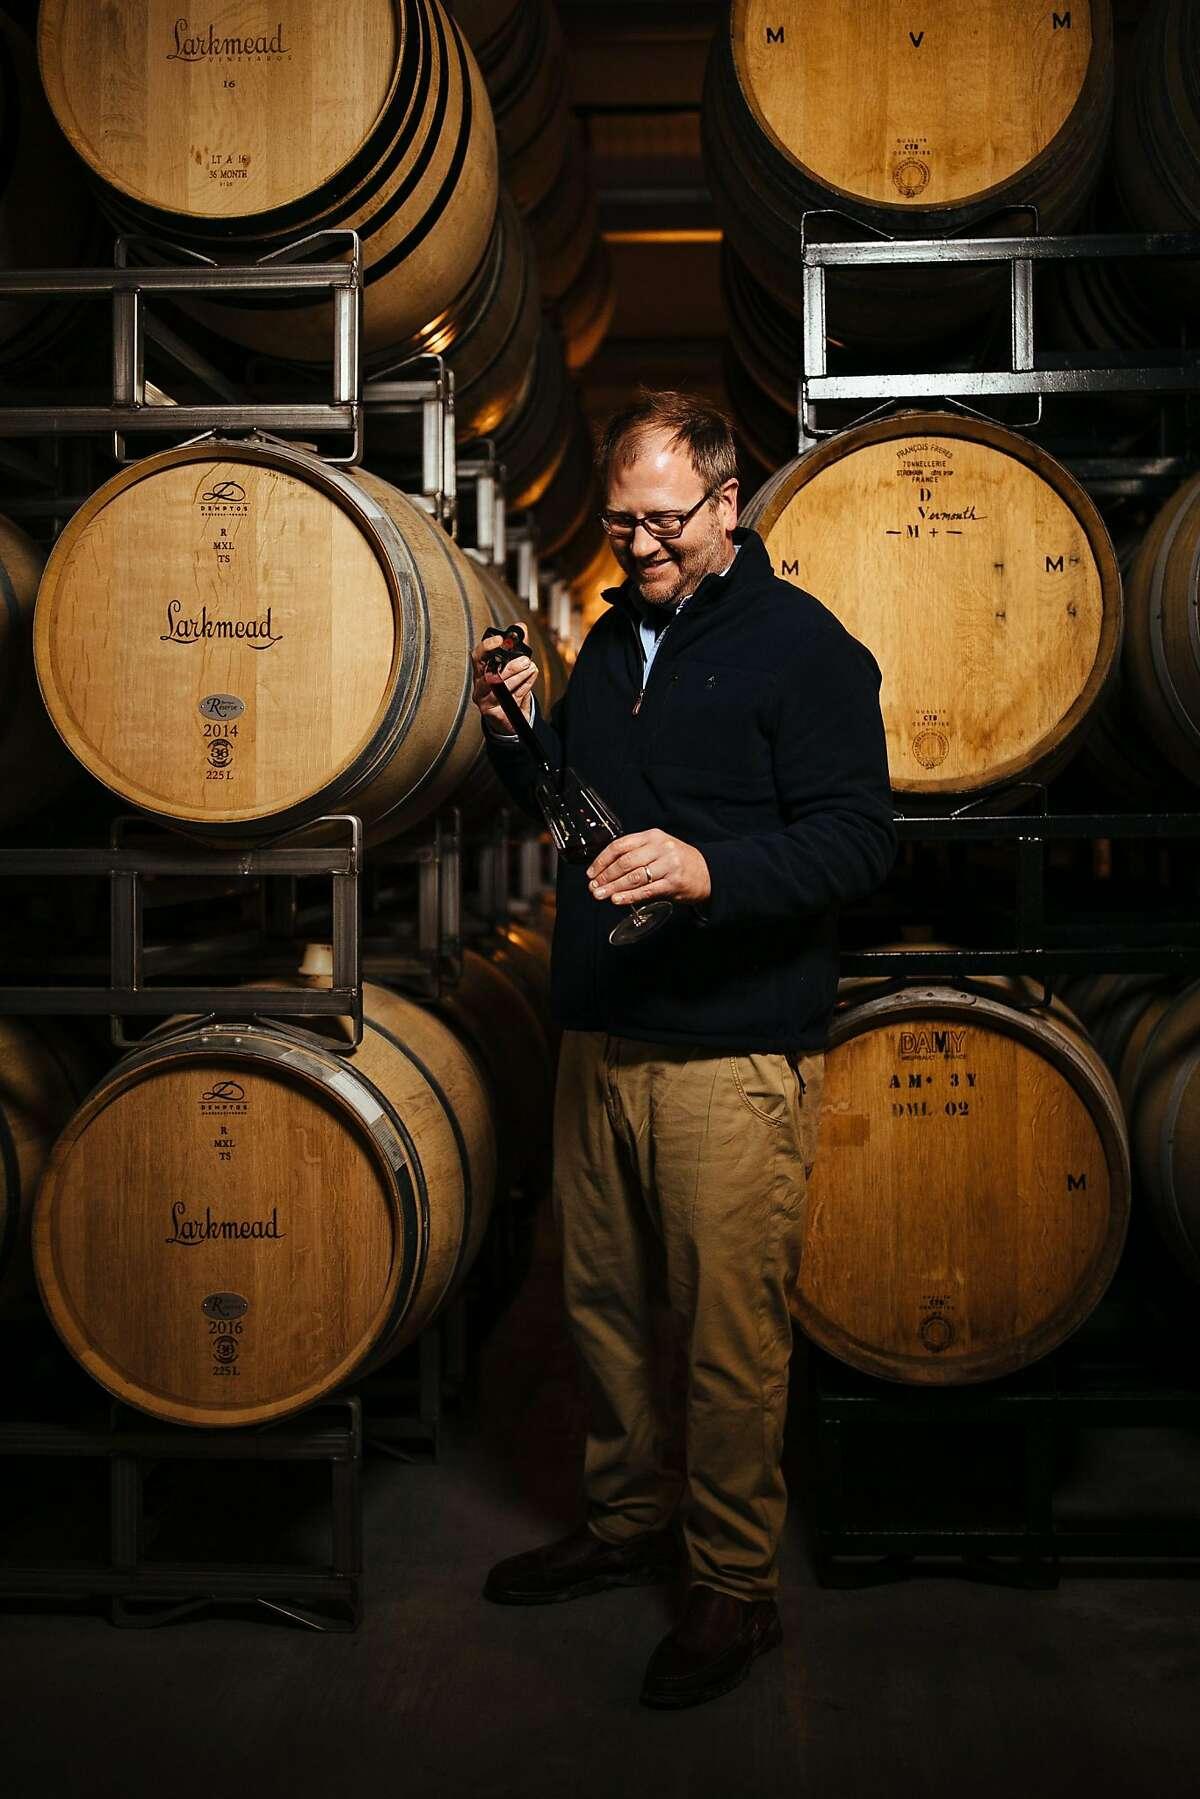 Dan Petroski uses a wine thief to taste wines from barrel at Larkmead Vineyards.